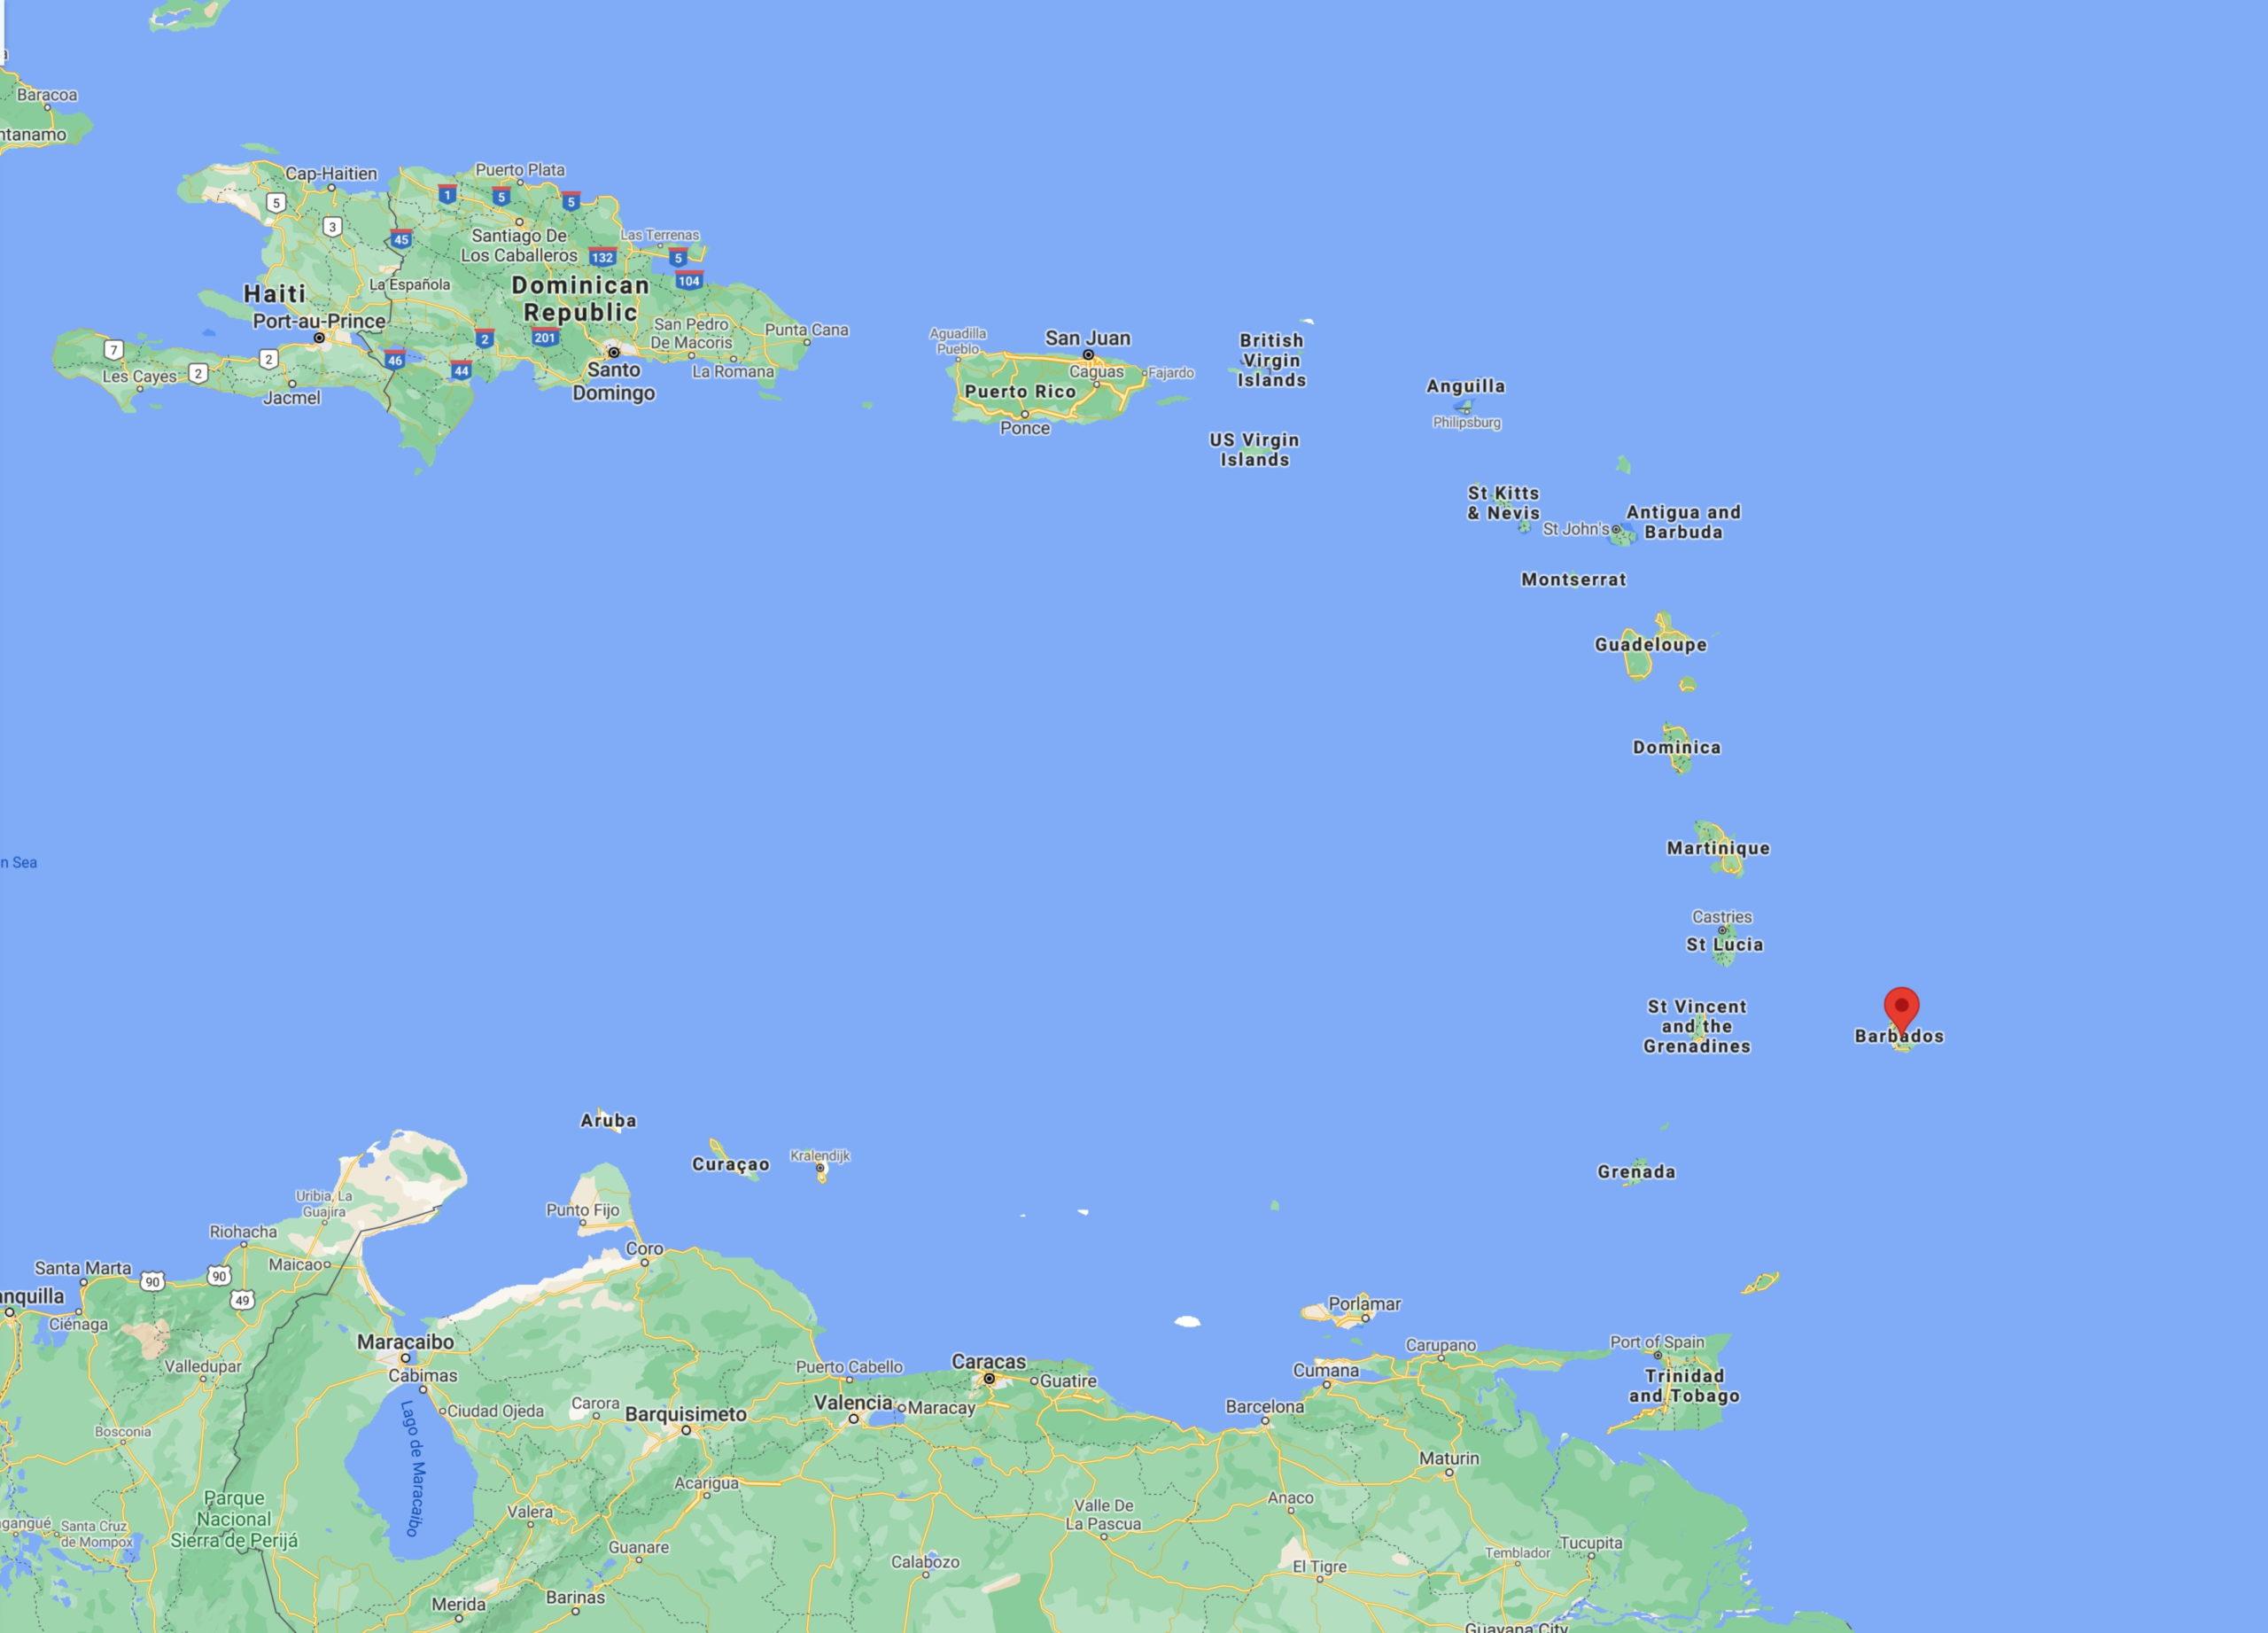 The tiny island of Barbados.